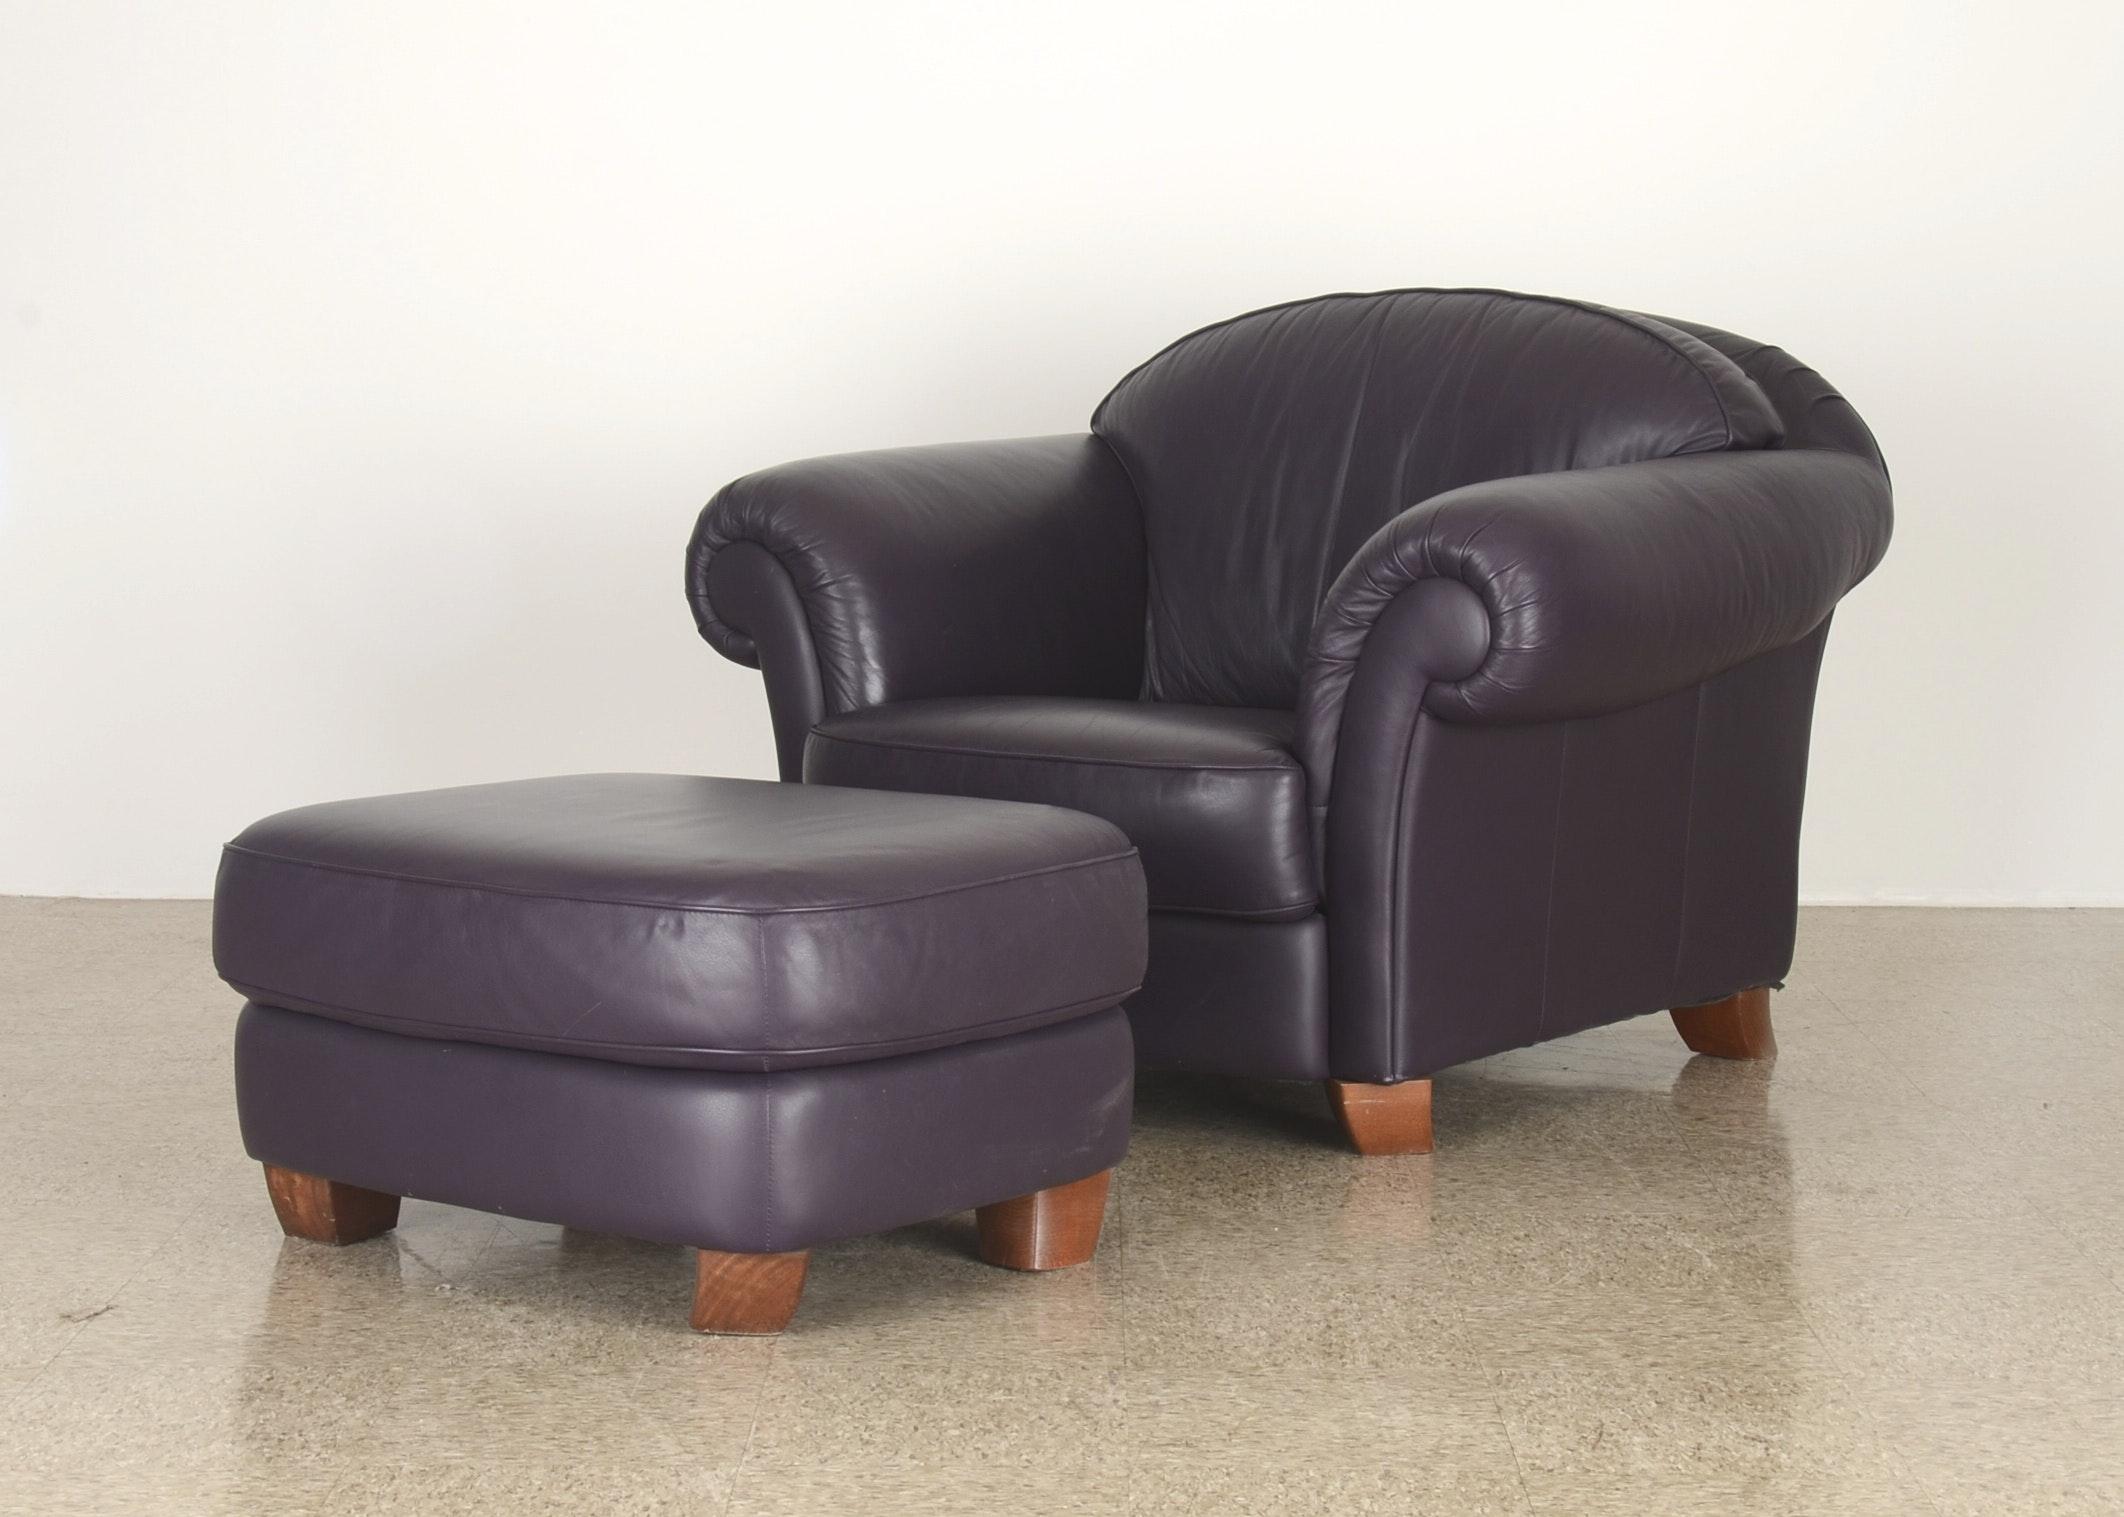 Natuzzi Italian Leather Chair With Ottoman ...